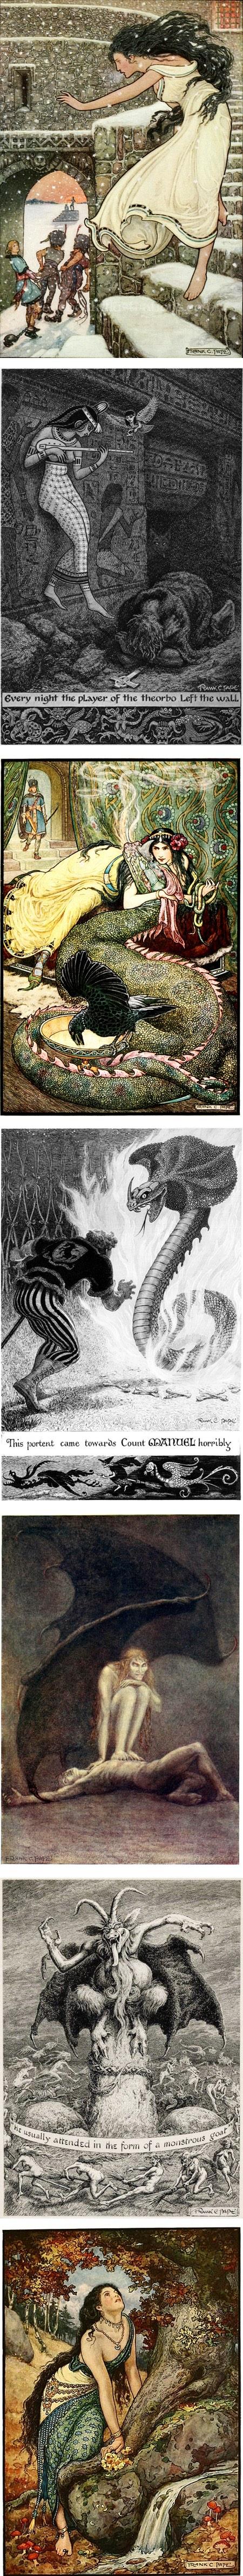 Frank C. Pape classic illustration